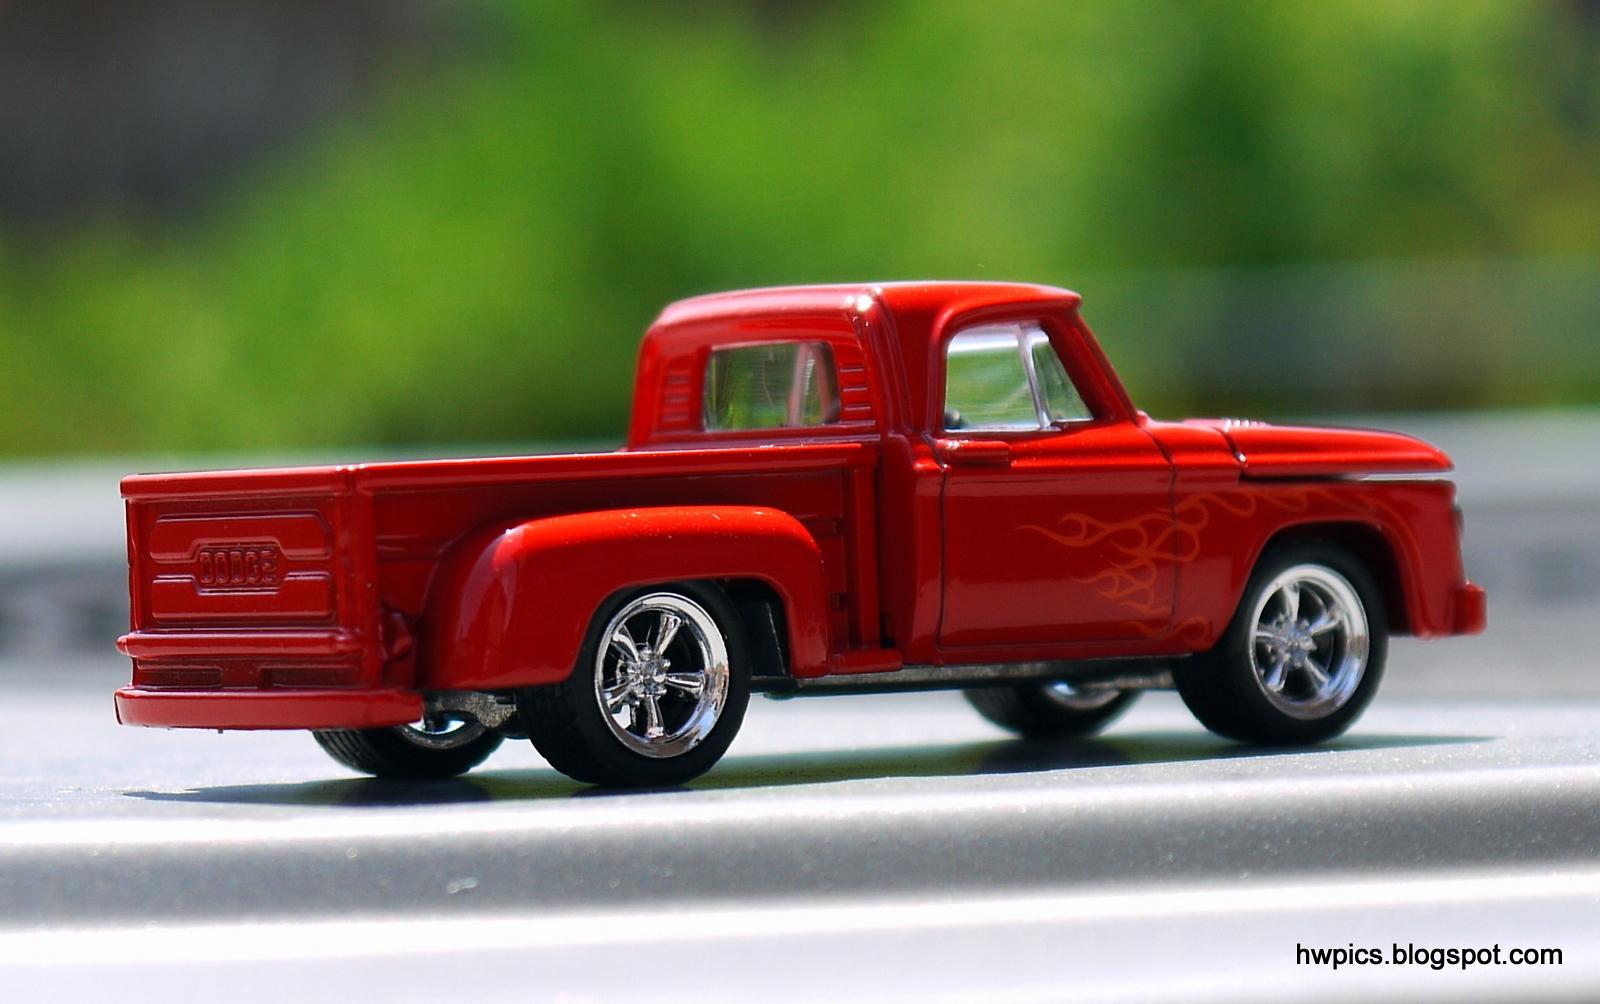 Mytoycars!: Greenlight 1965 Dodge D-100 pickup